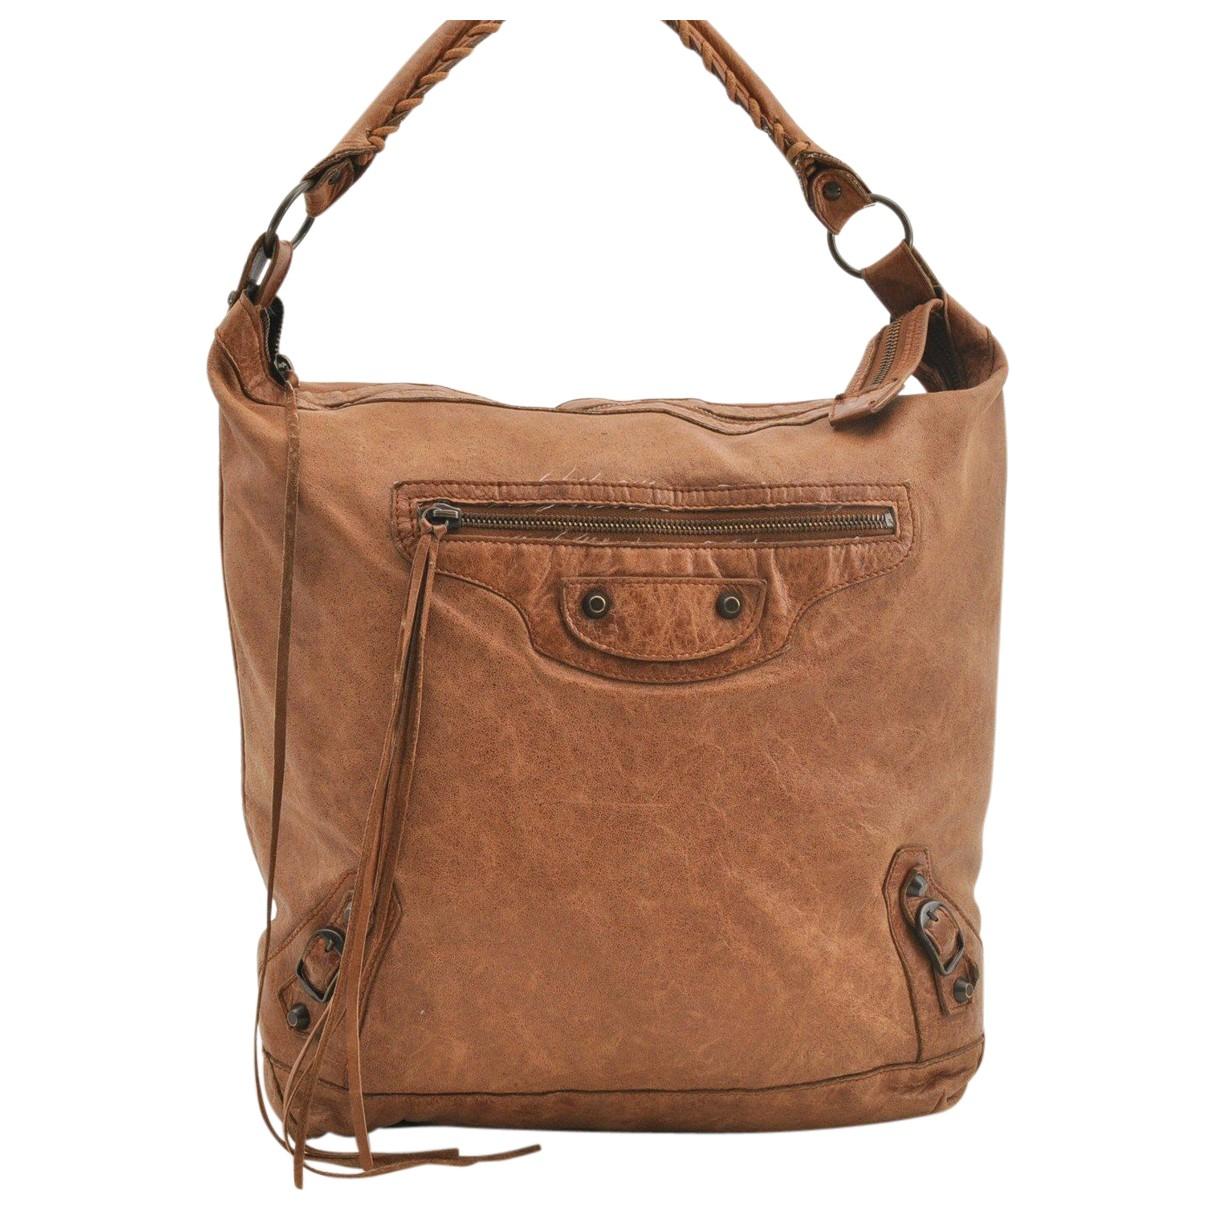 Balenciaga - Sac a main   pour femme en cuir - marron